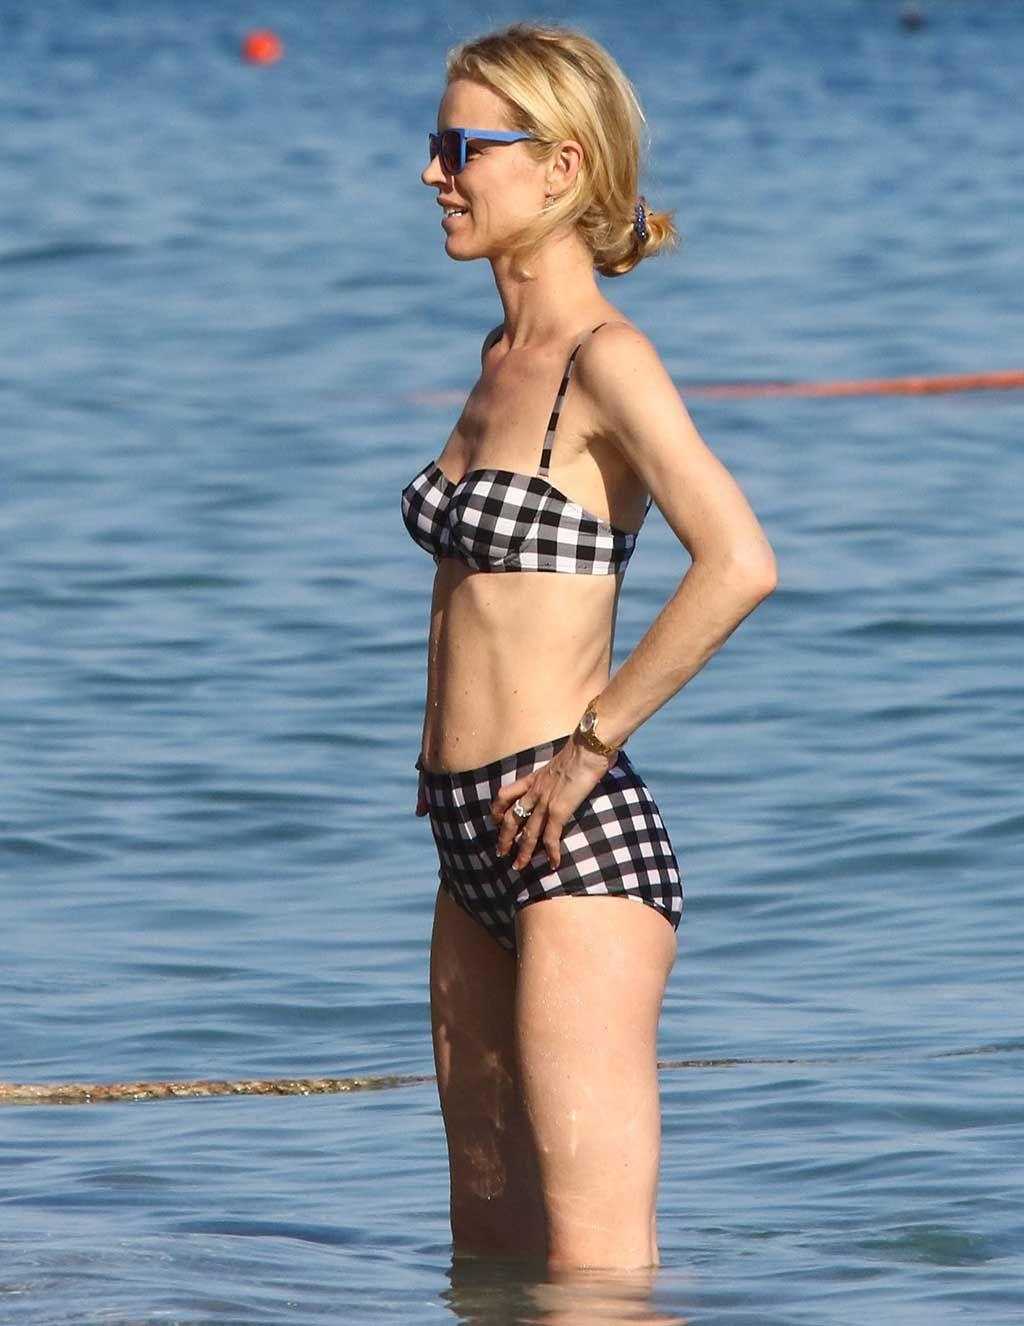 Bikini Eva Herzigova nudes (74 photos), Ass, Hot, Instagram, cameltoe 2015